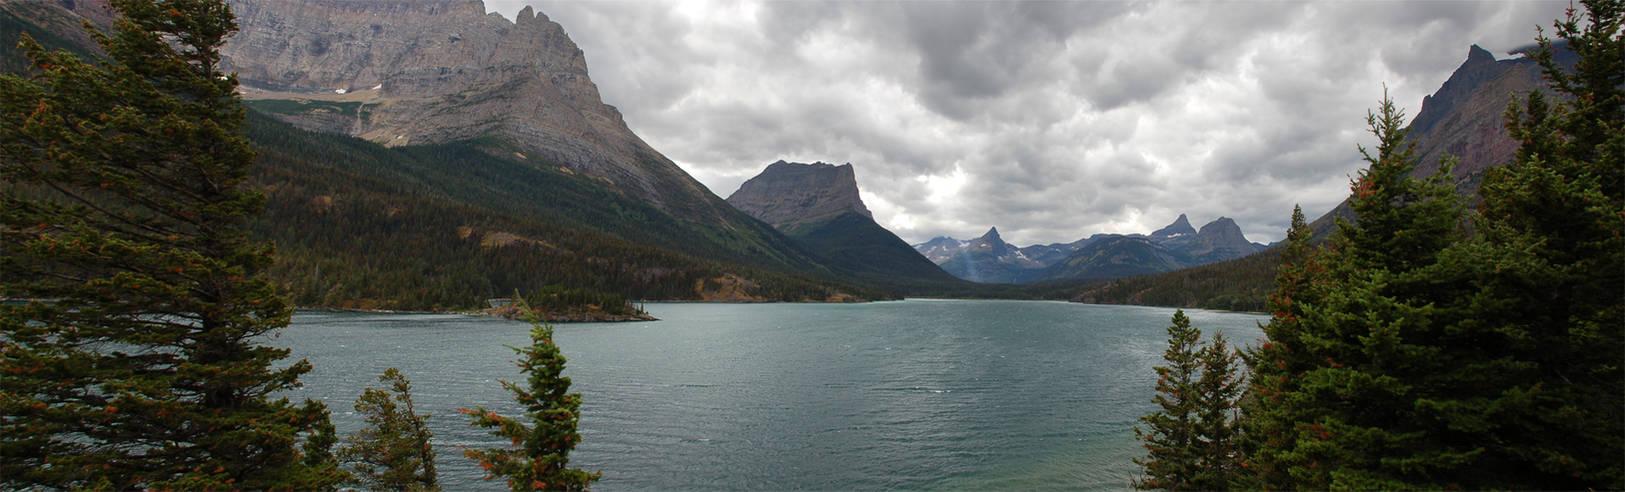 Saint Mary Lake 1 2007-08-20